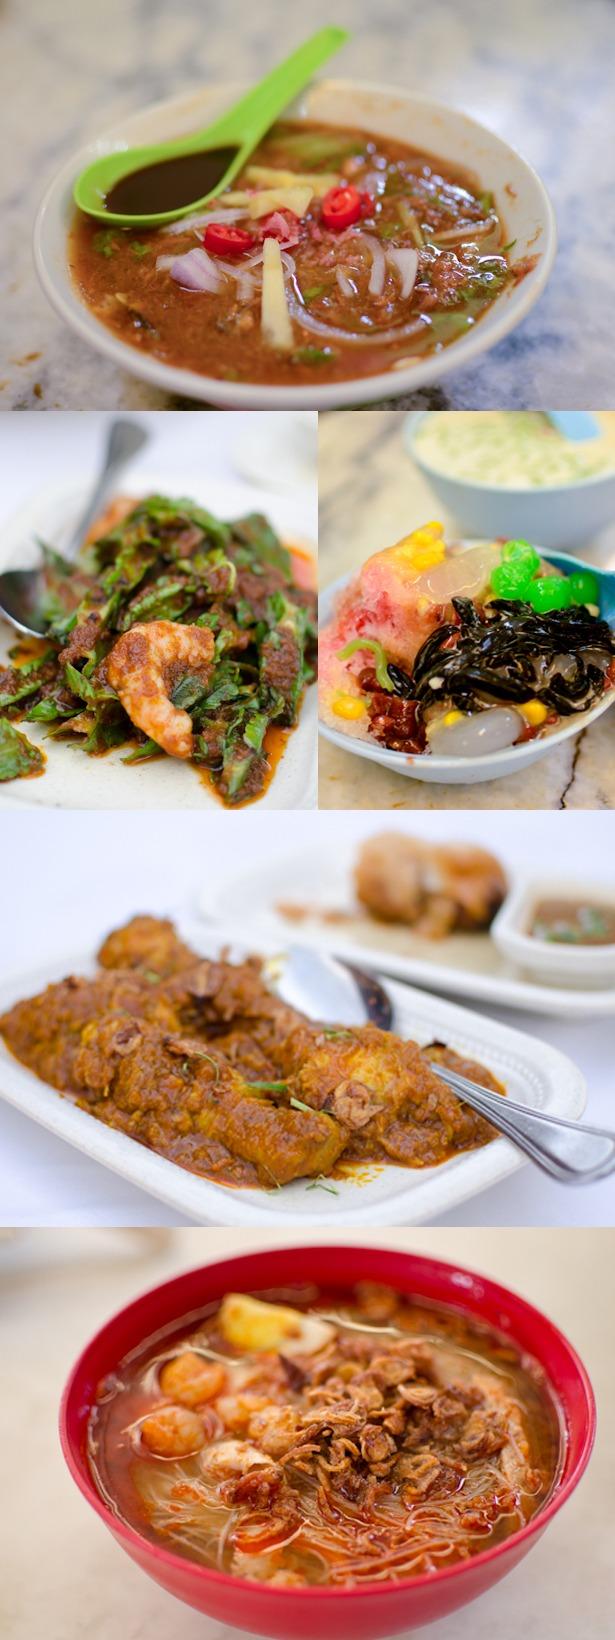 Food of Penang